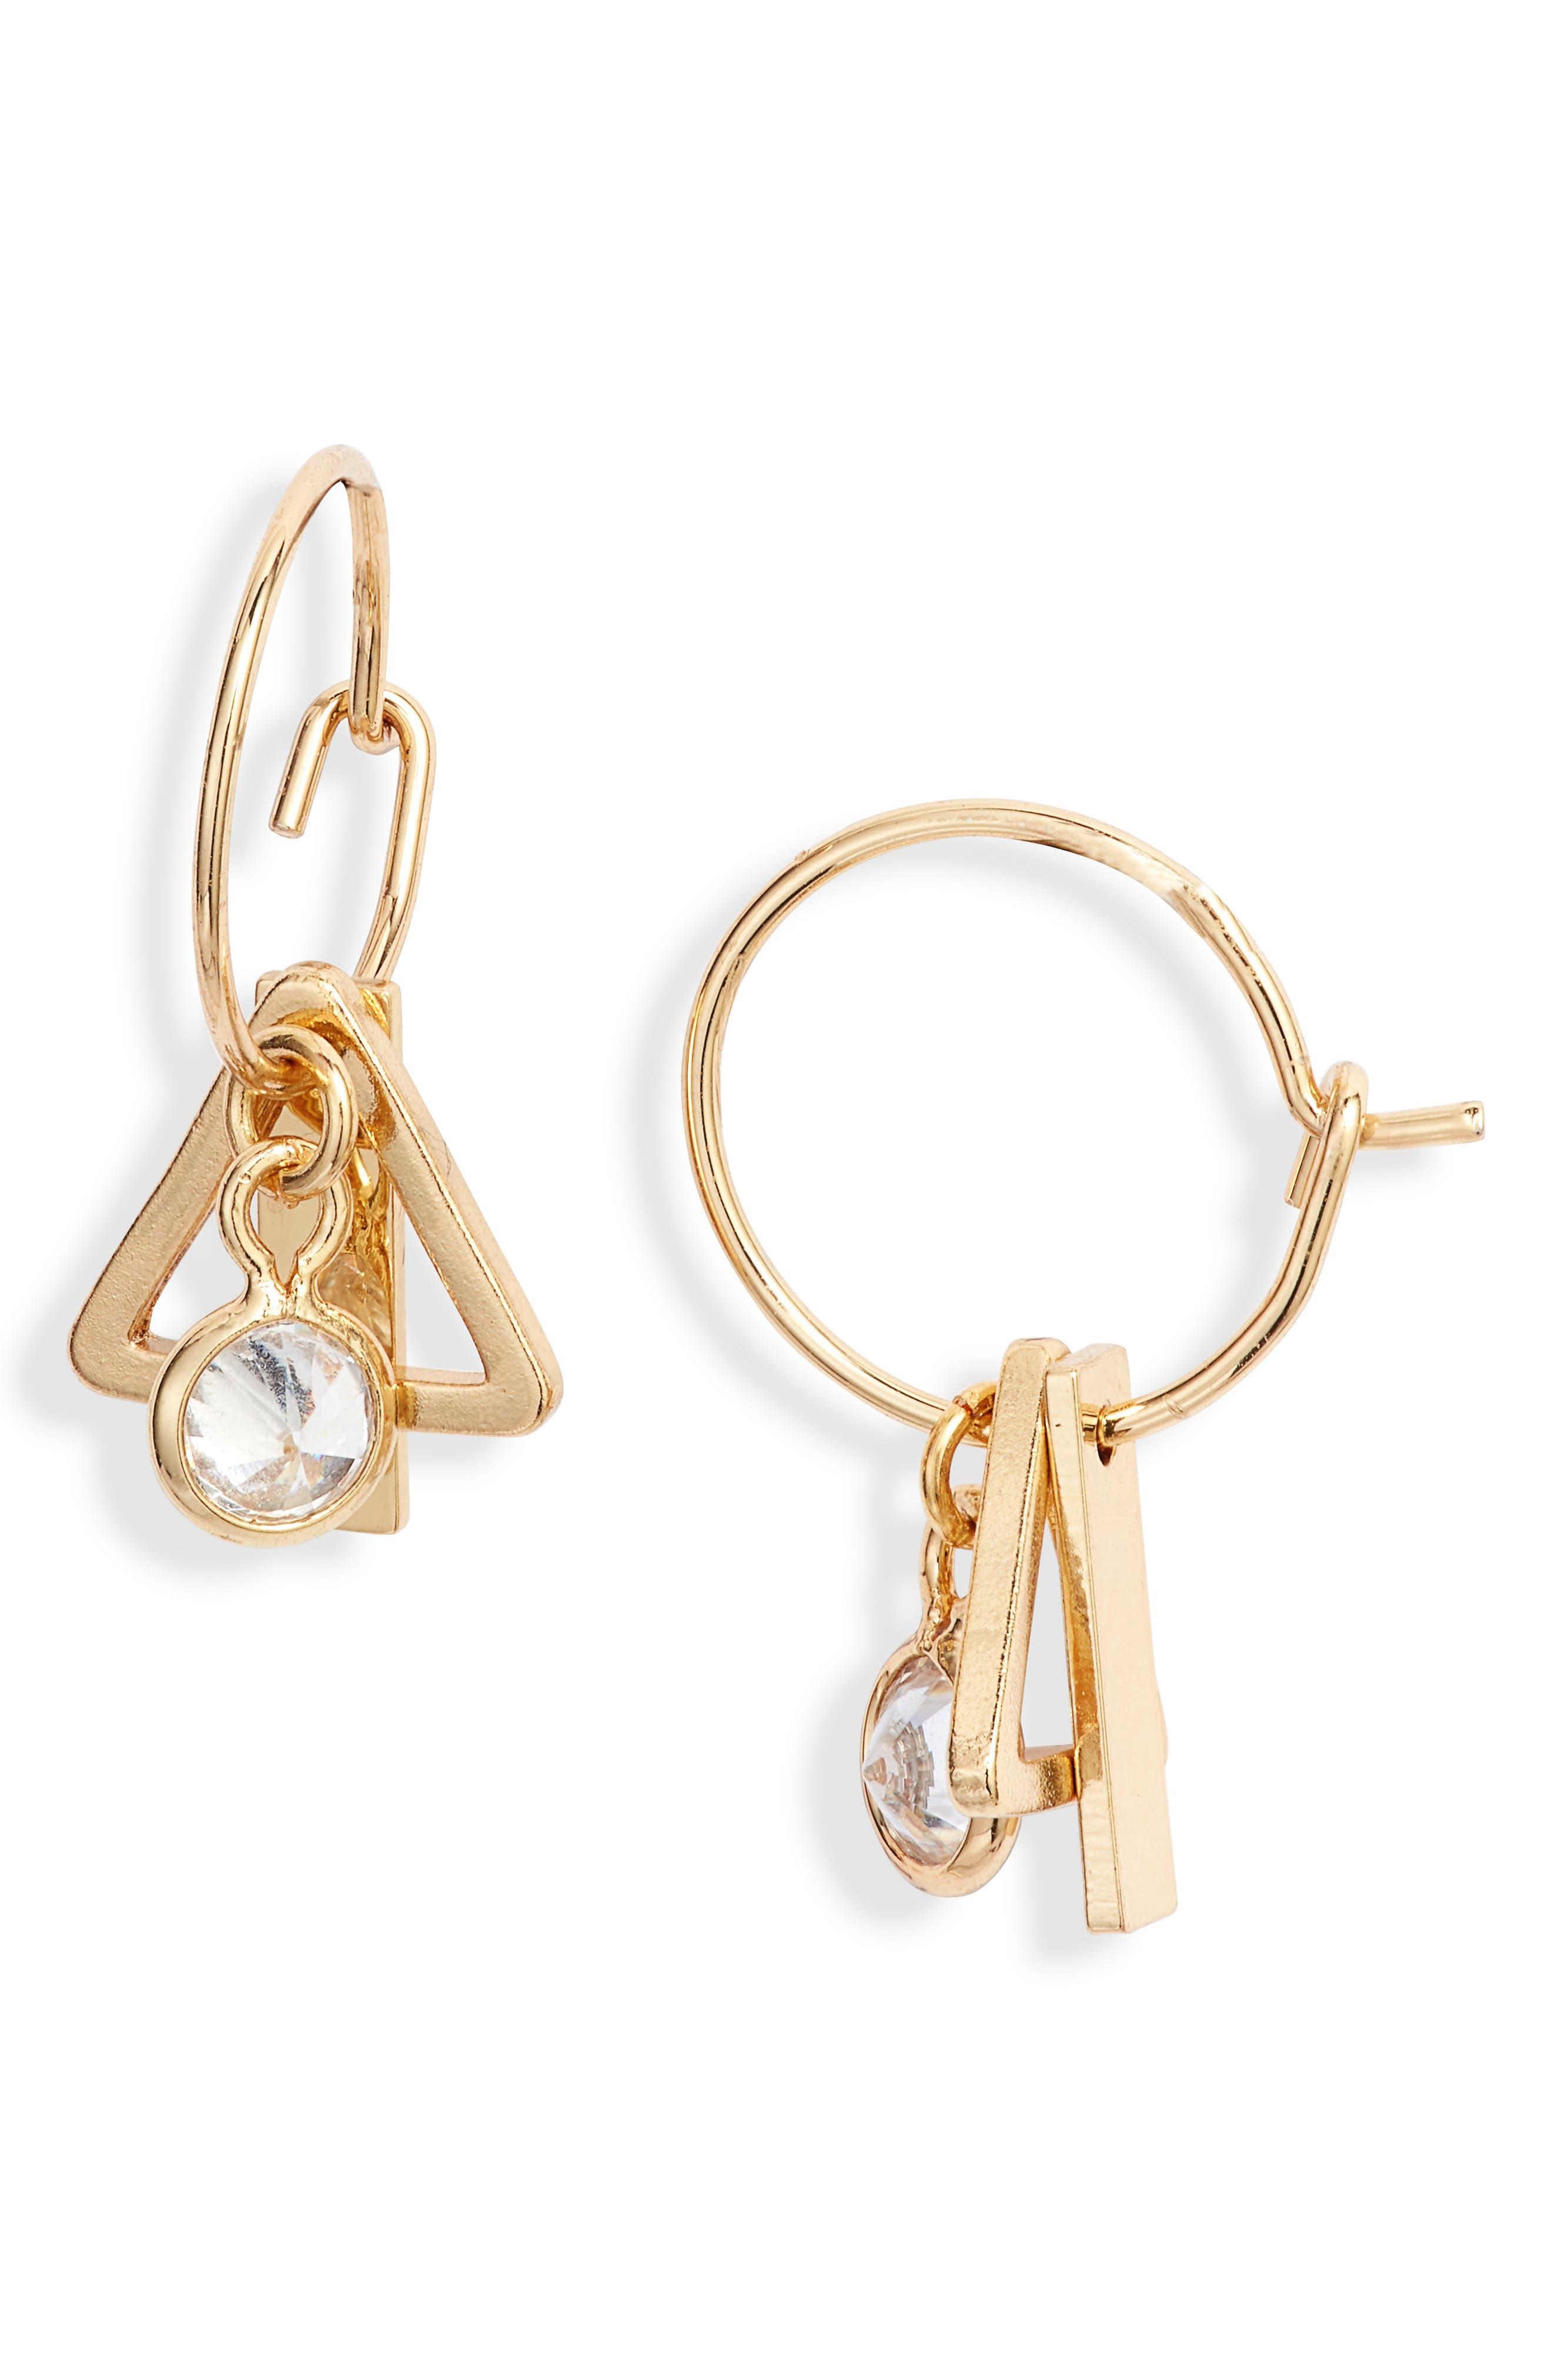 Tiny Charm Hoop Earrings